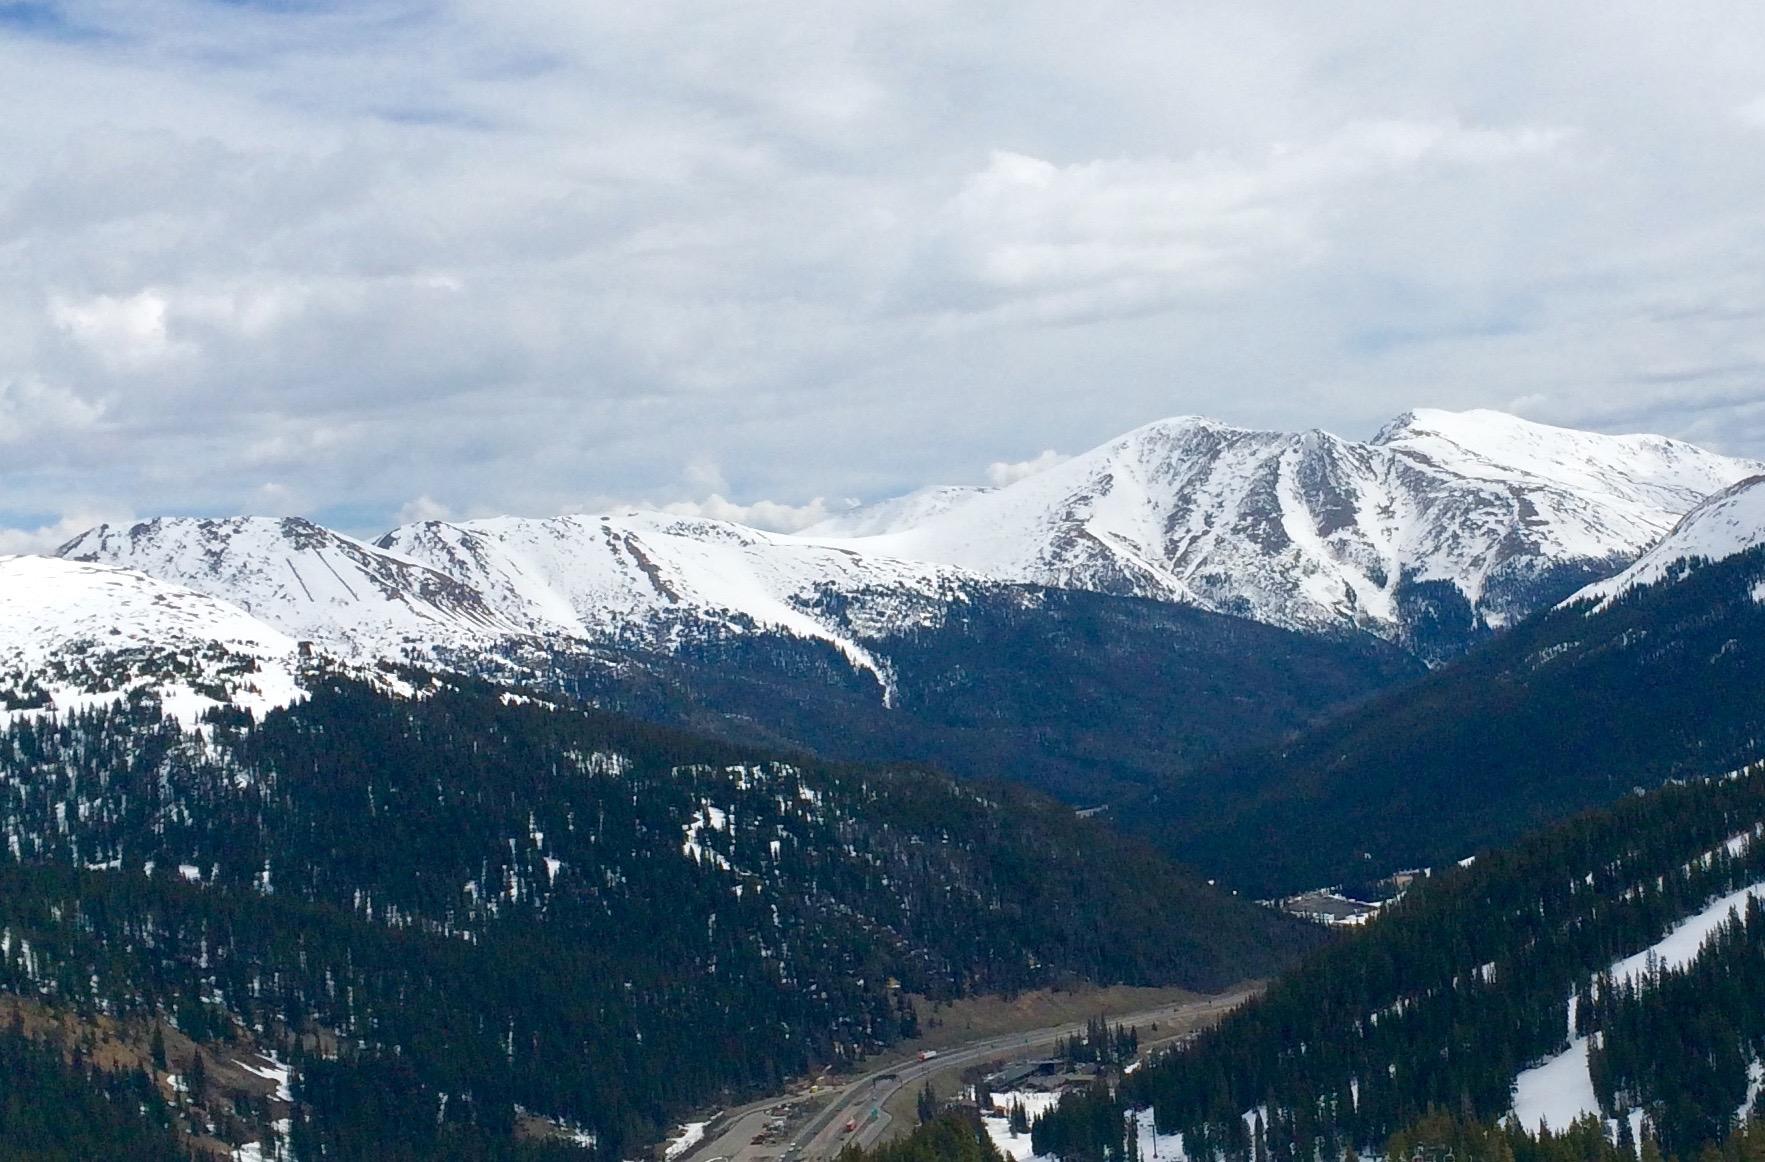 Mount Machebeuf, Parnassus, and Bard Peak from the Loveland Ski Area.